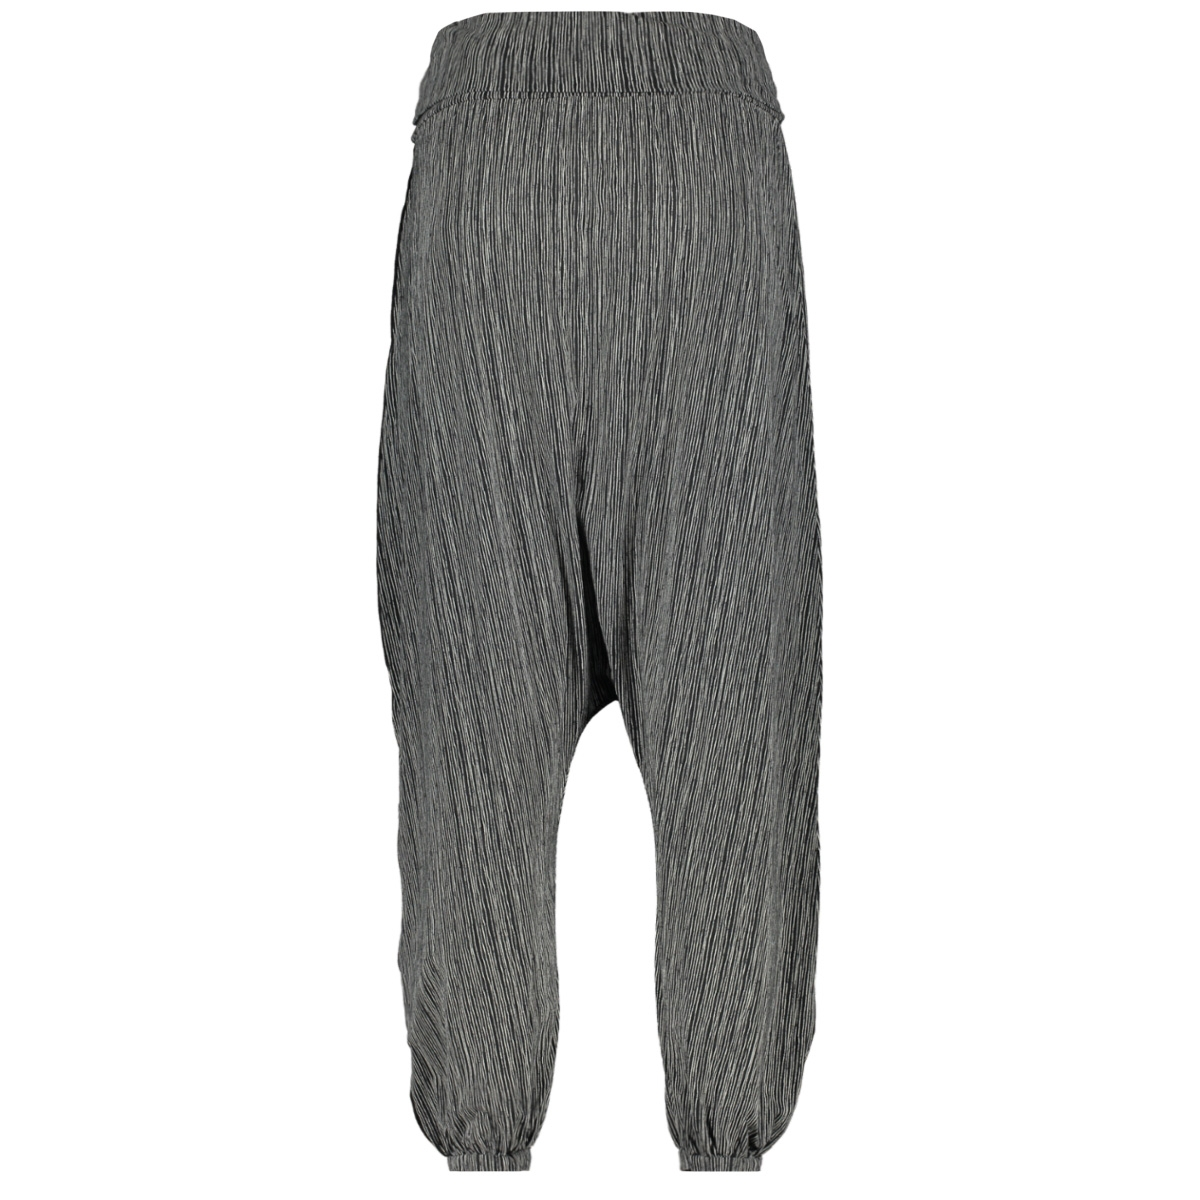 suave pants thin stripe 20 045 9101 10 days broek charcoal